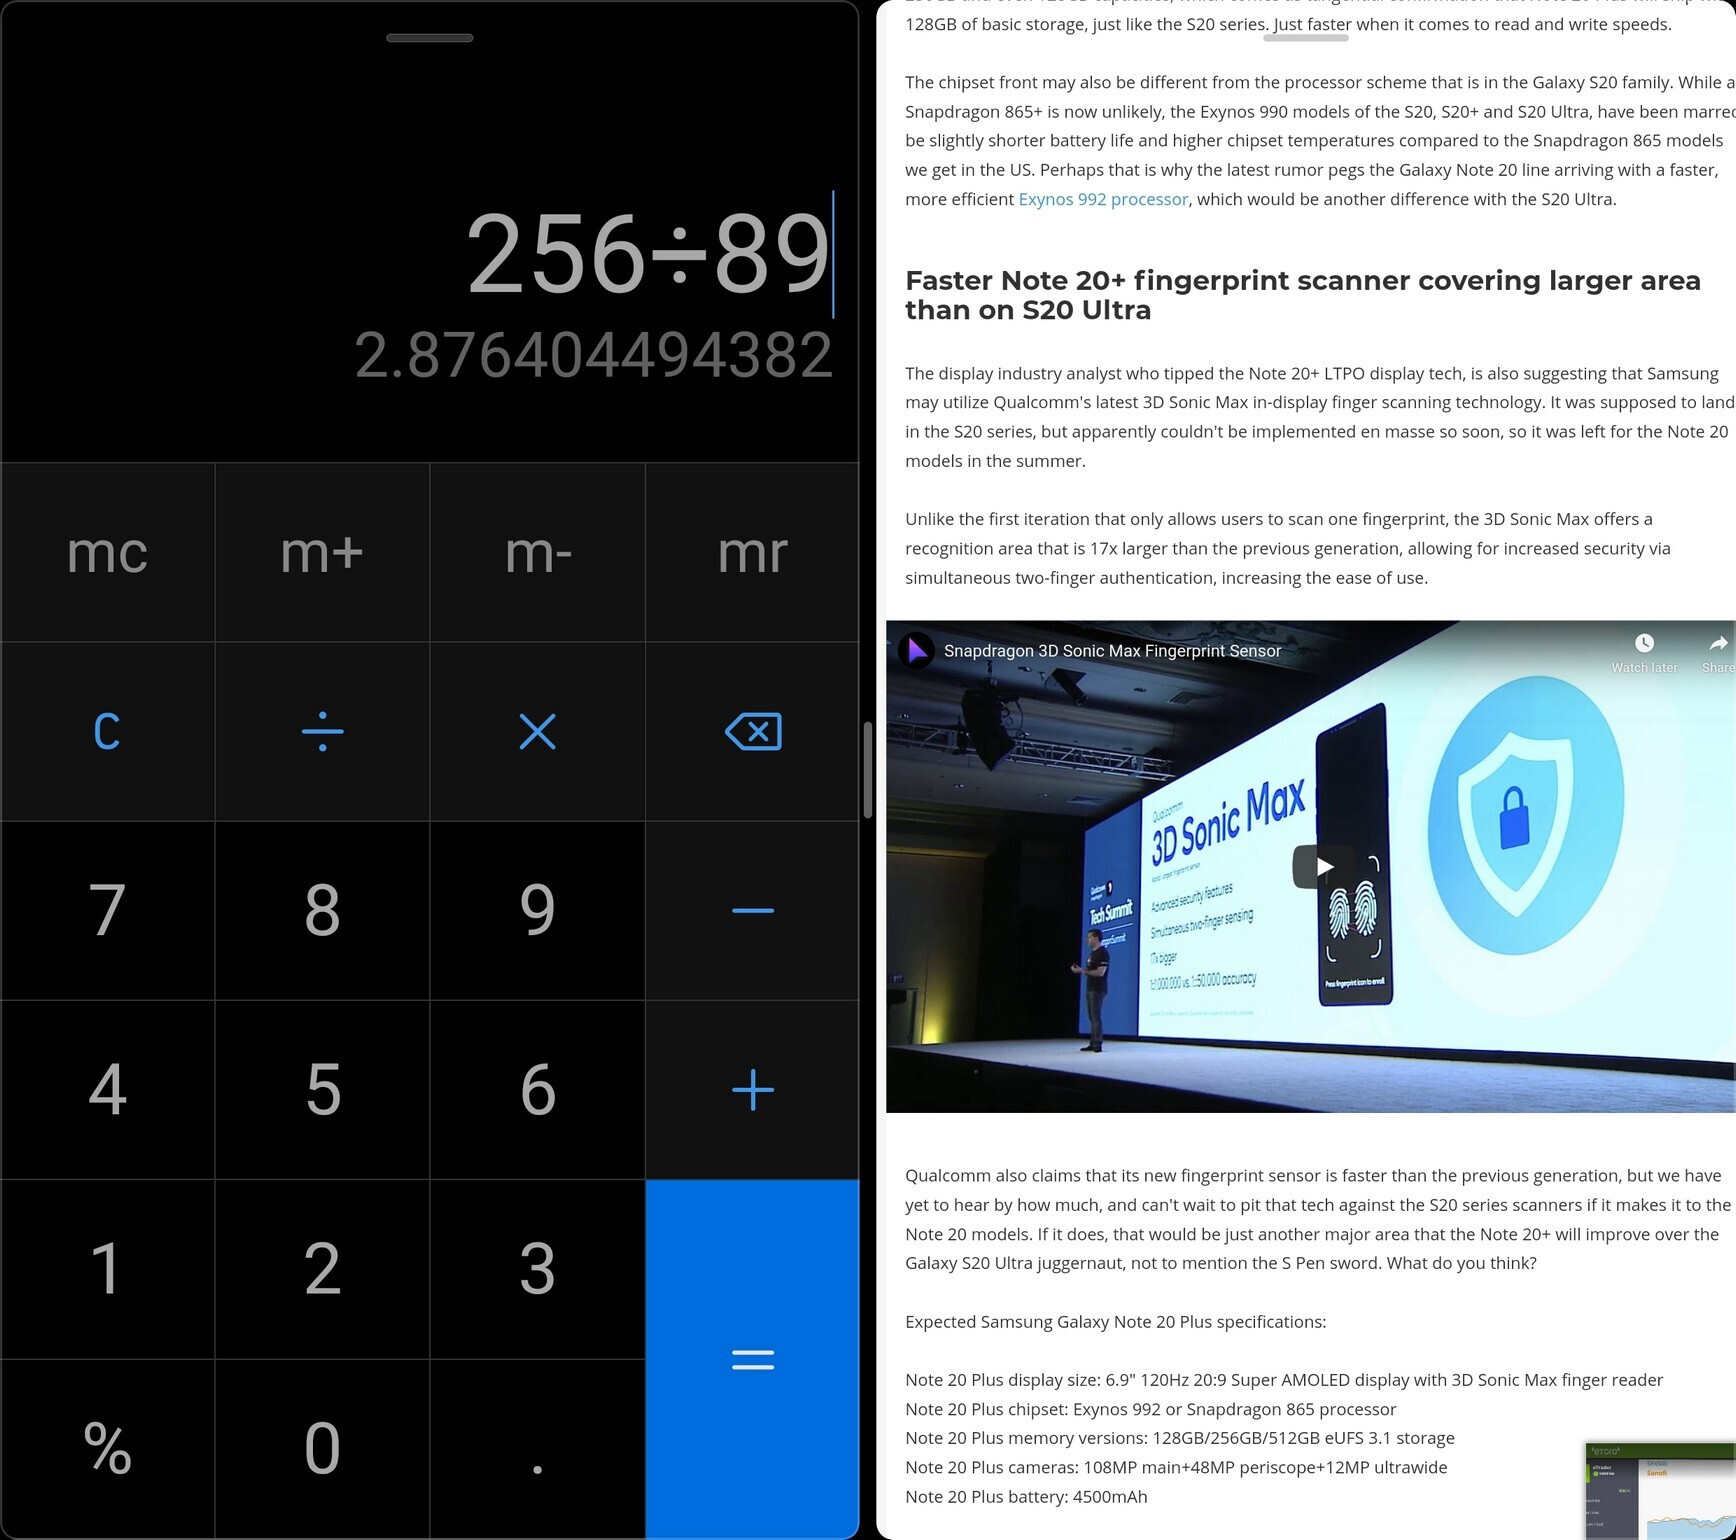 Huawei-Mate-Xs-interface-17.jpg